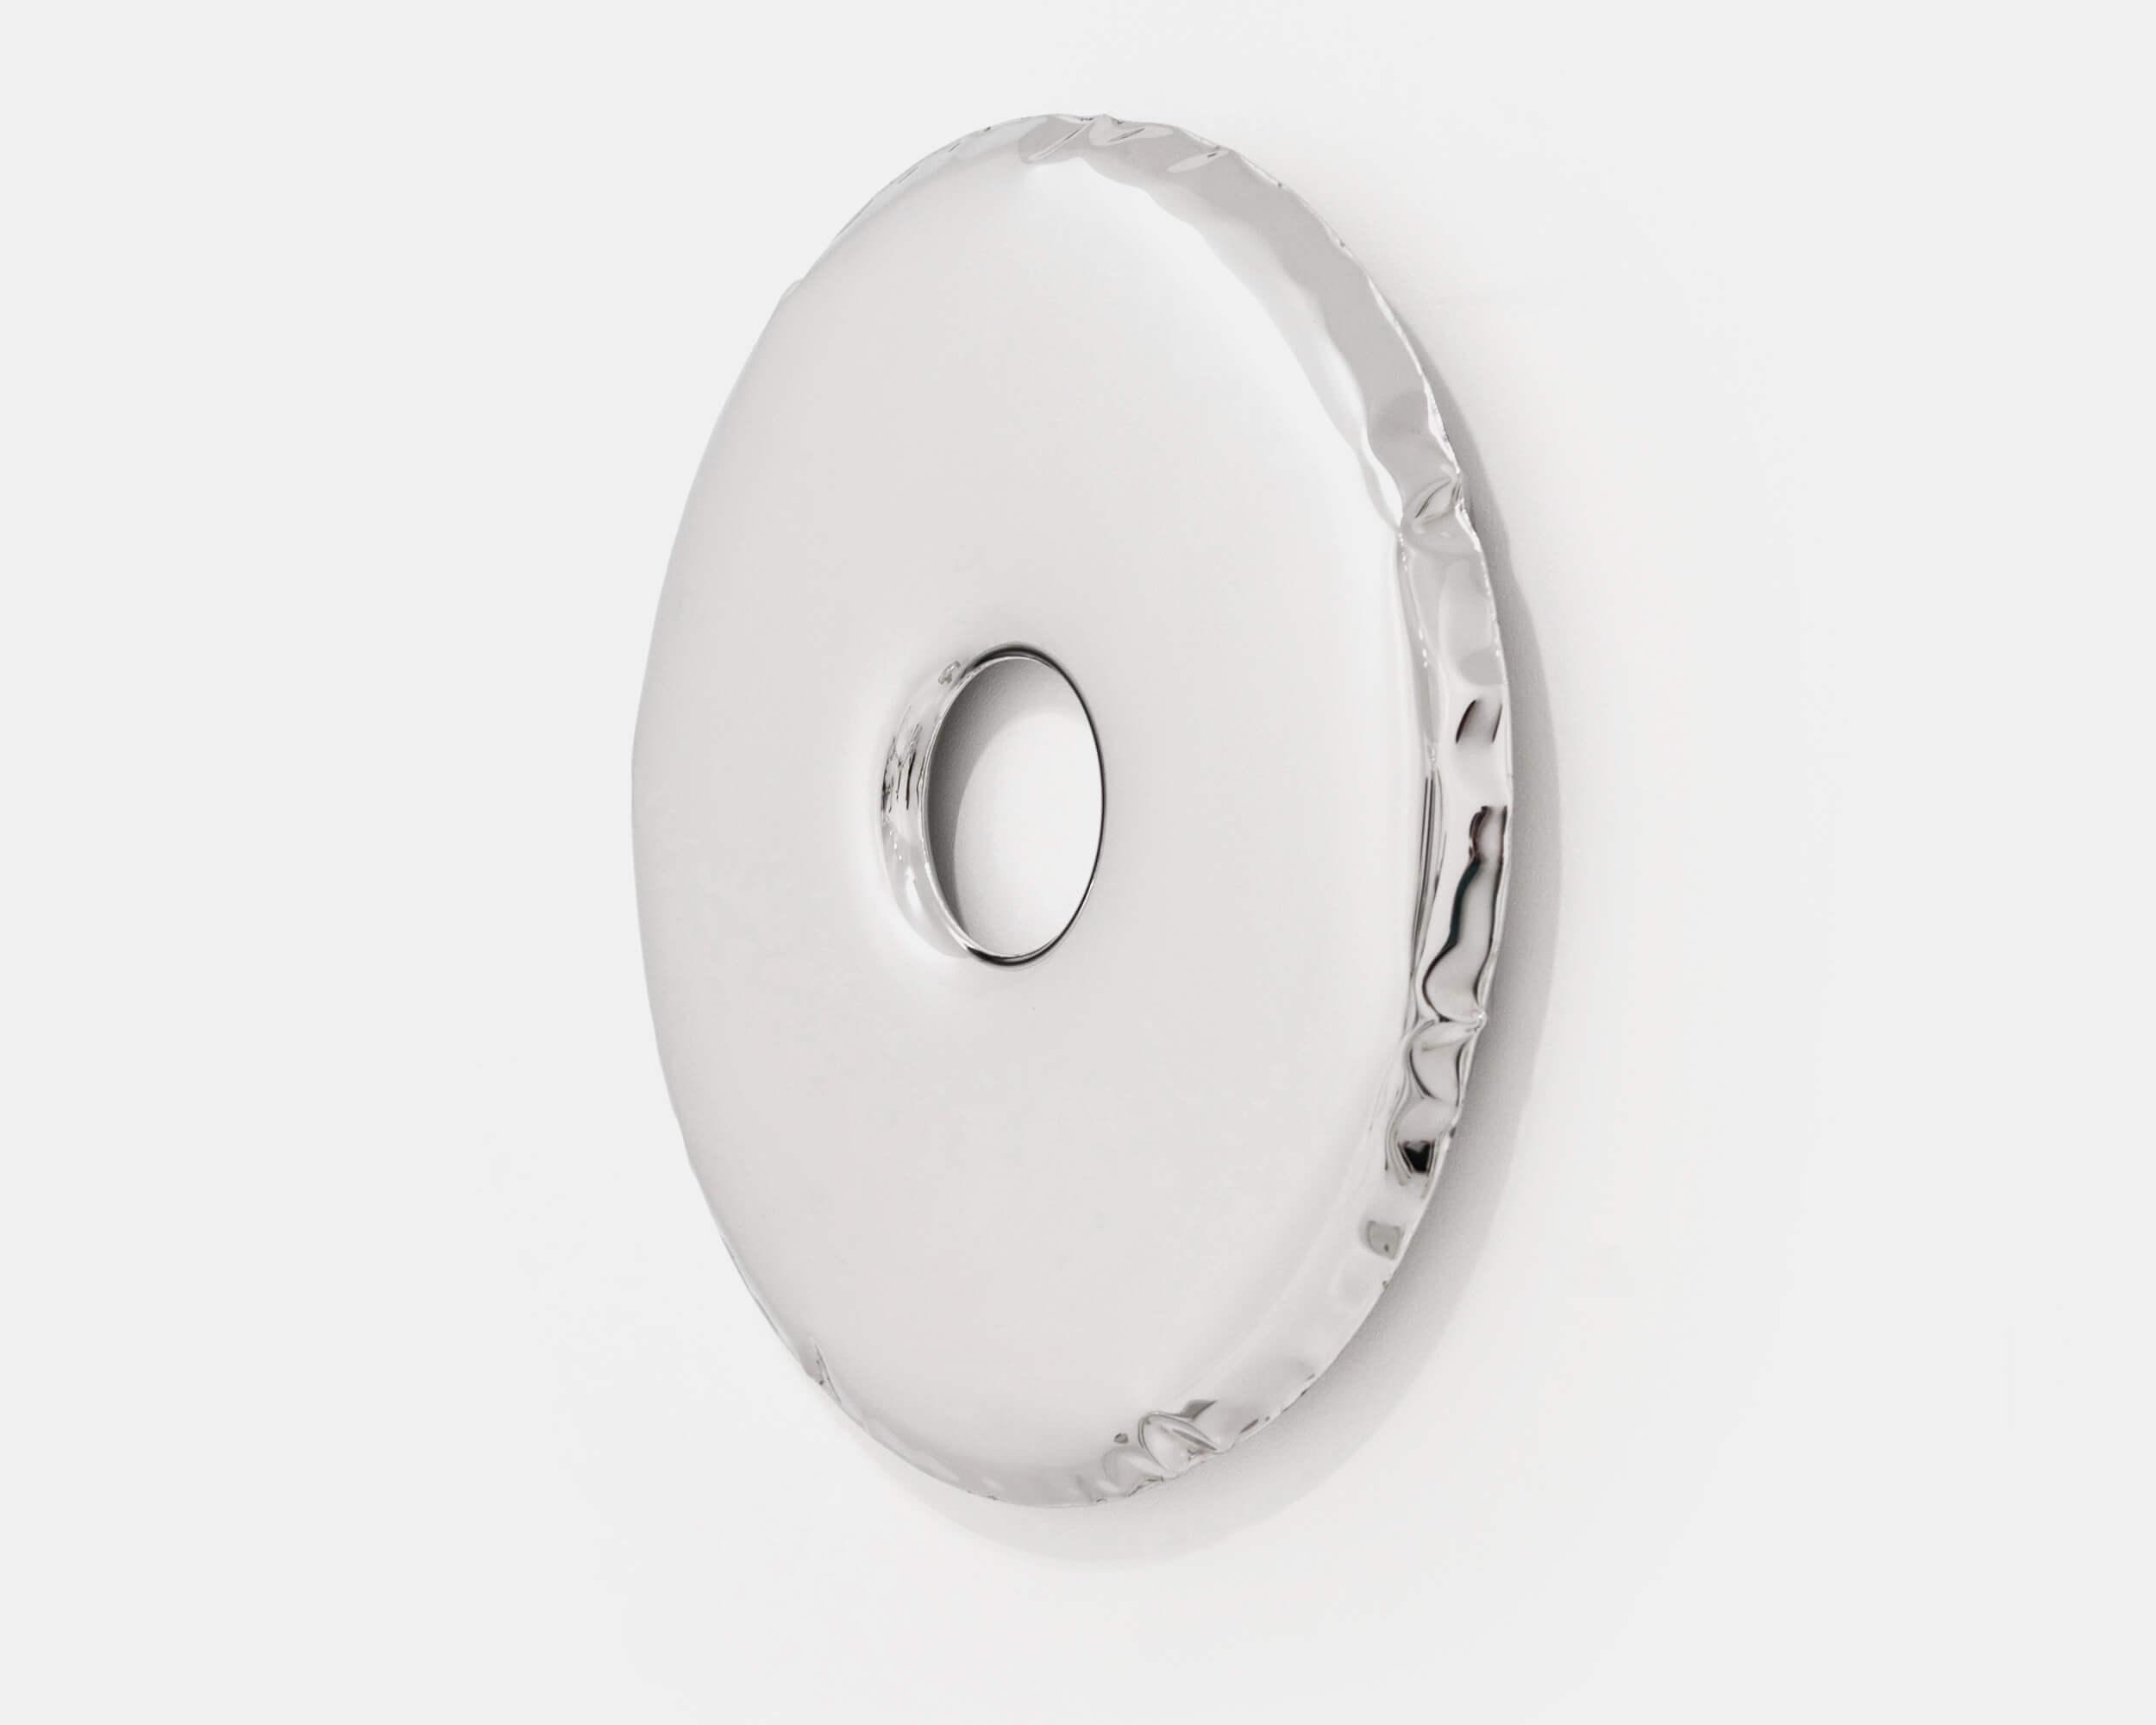 donut-mirror-silver-3